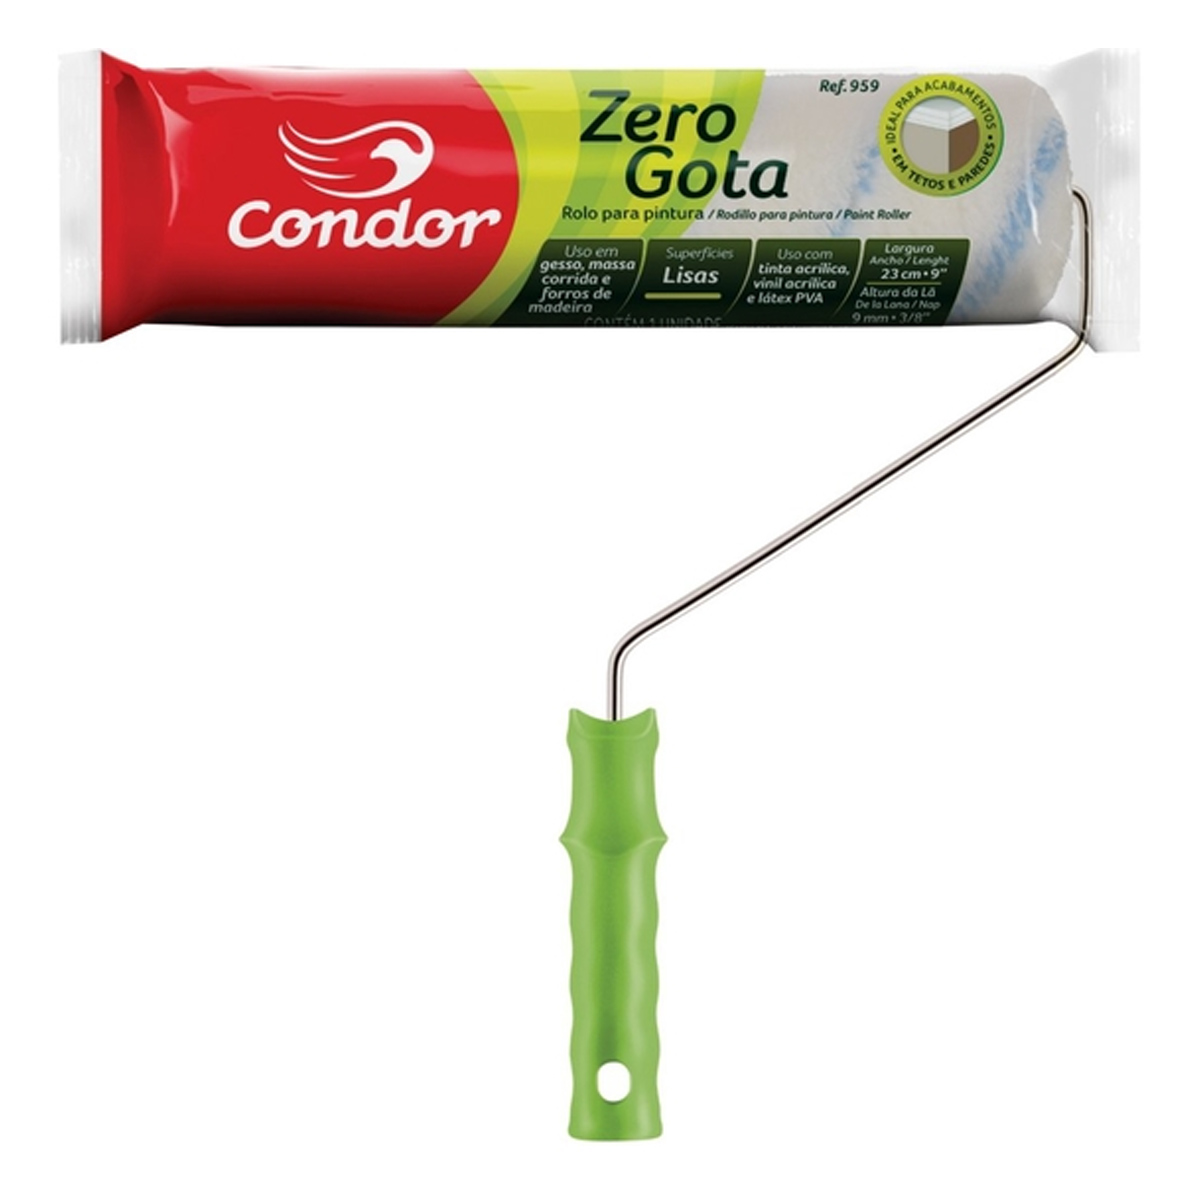 Rolo La Zero Gota C/c - 959 Condor Tamanho / Medidas:23cm Tamanho / Medidas:23cm Tamanho / Medidas:23cm Tamanho / Medida